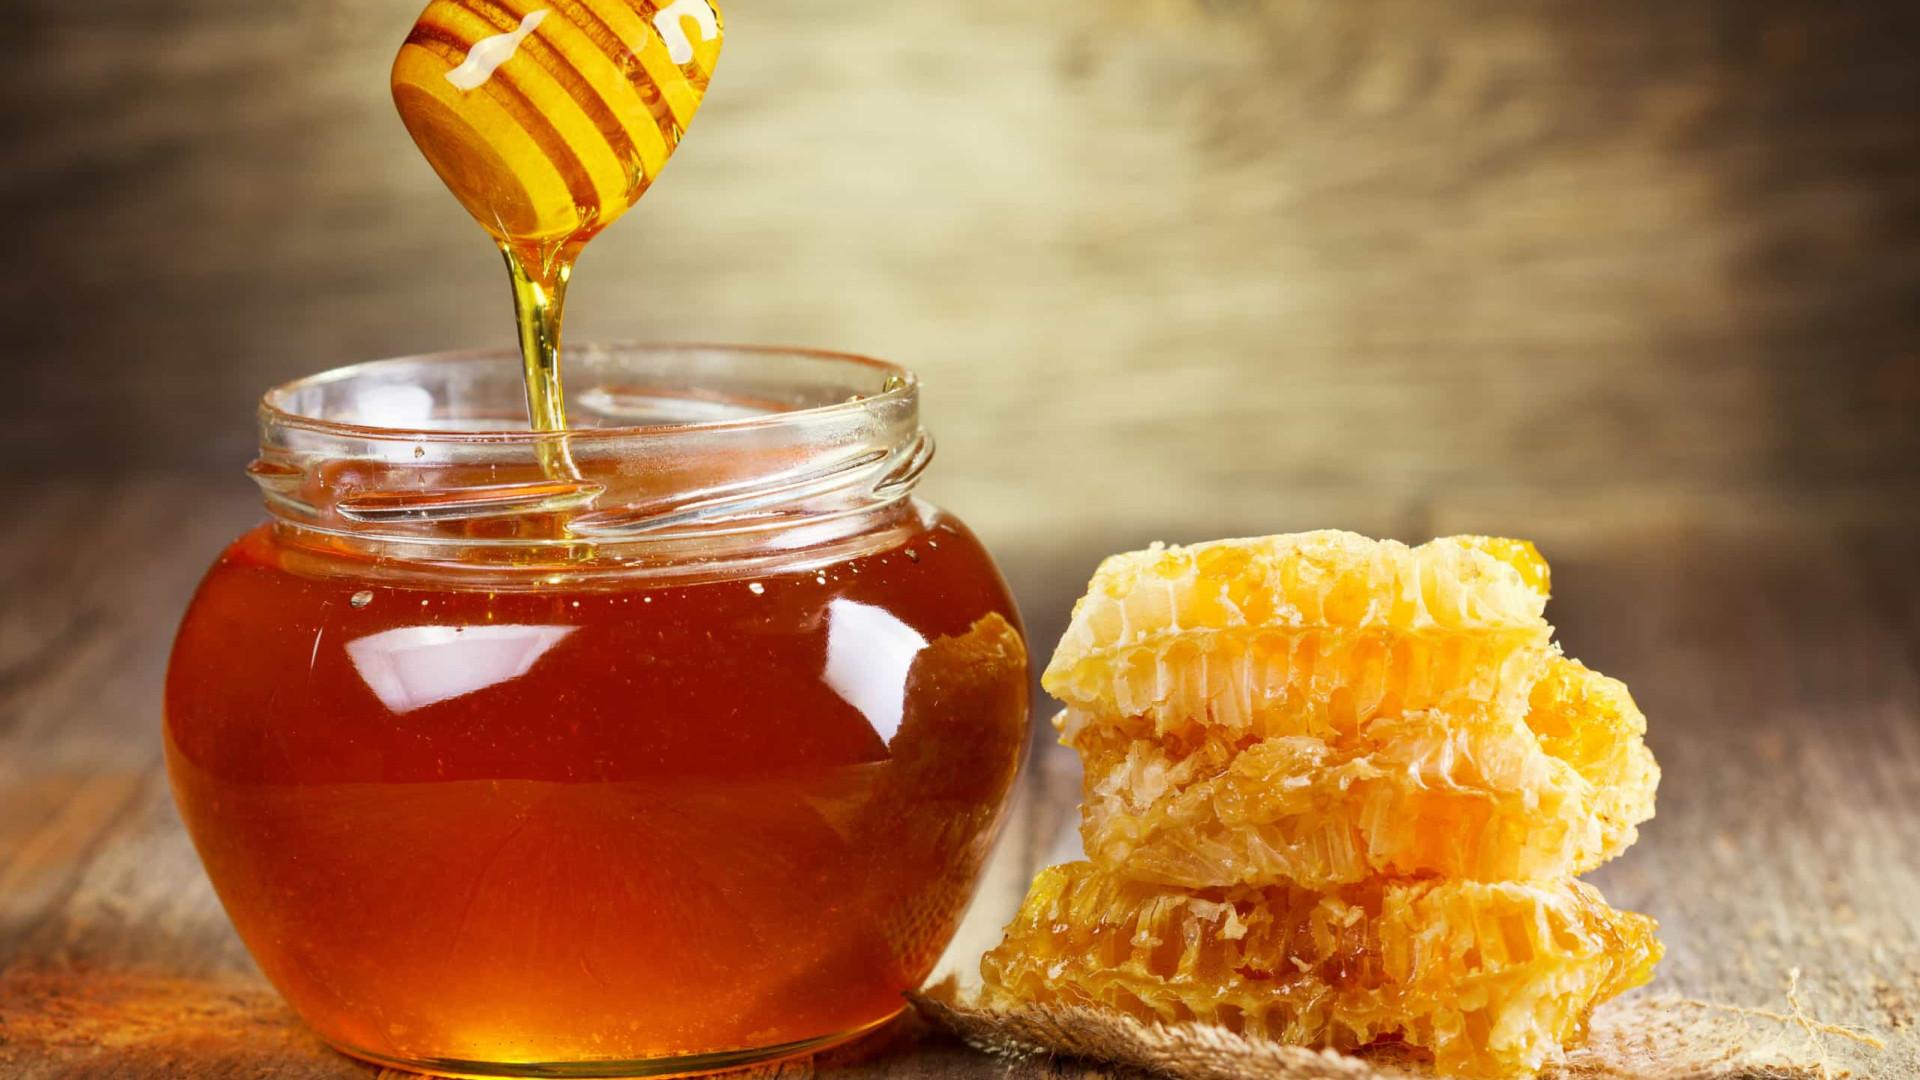 mel abelhas e diabetes